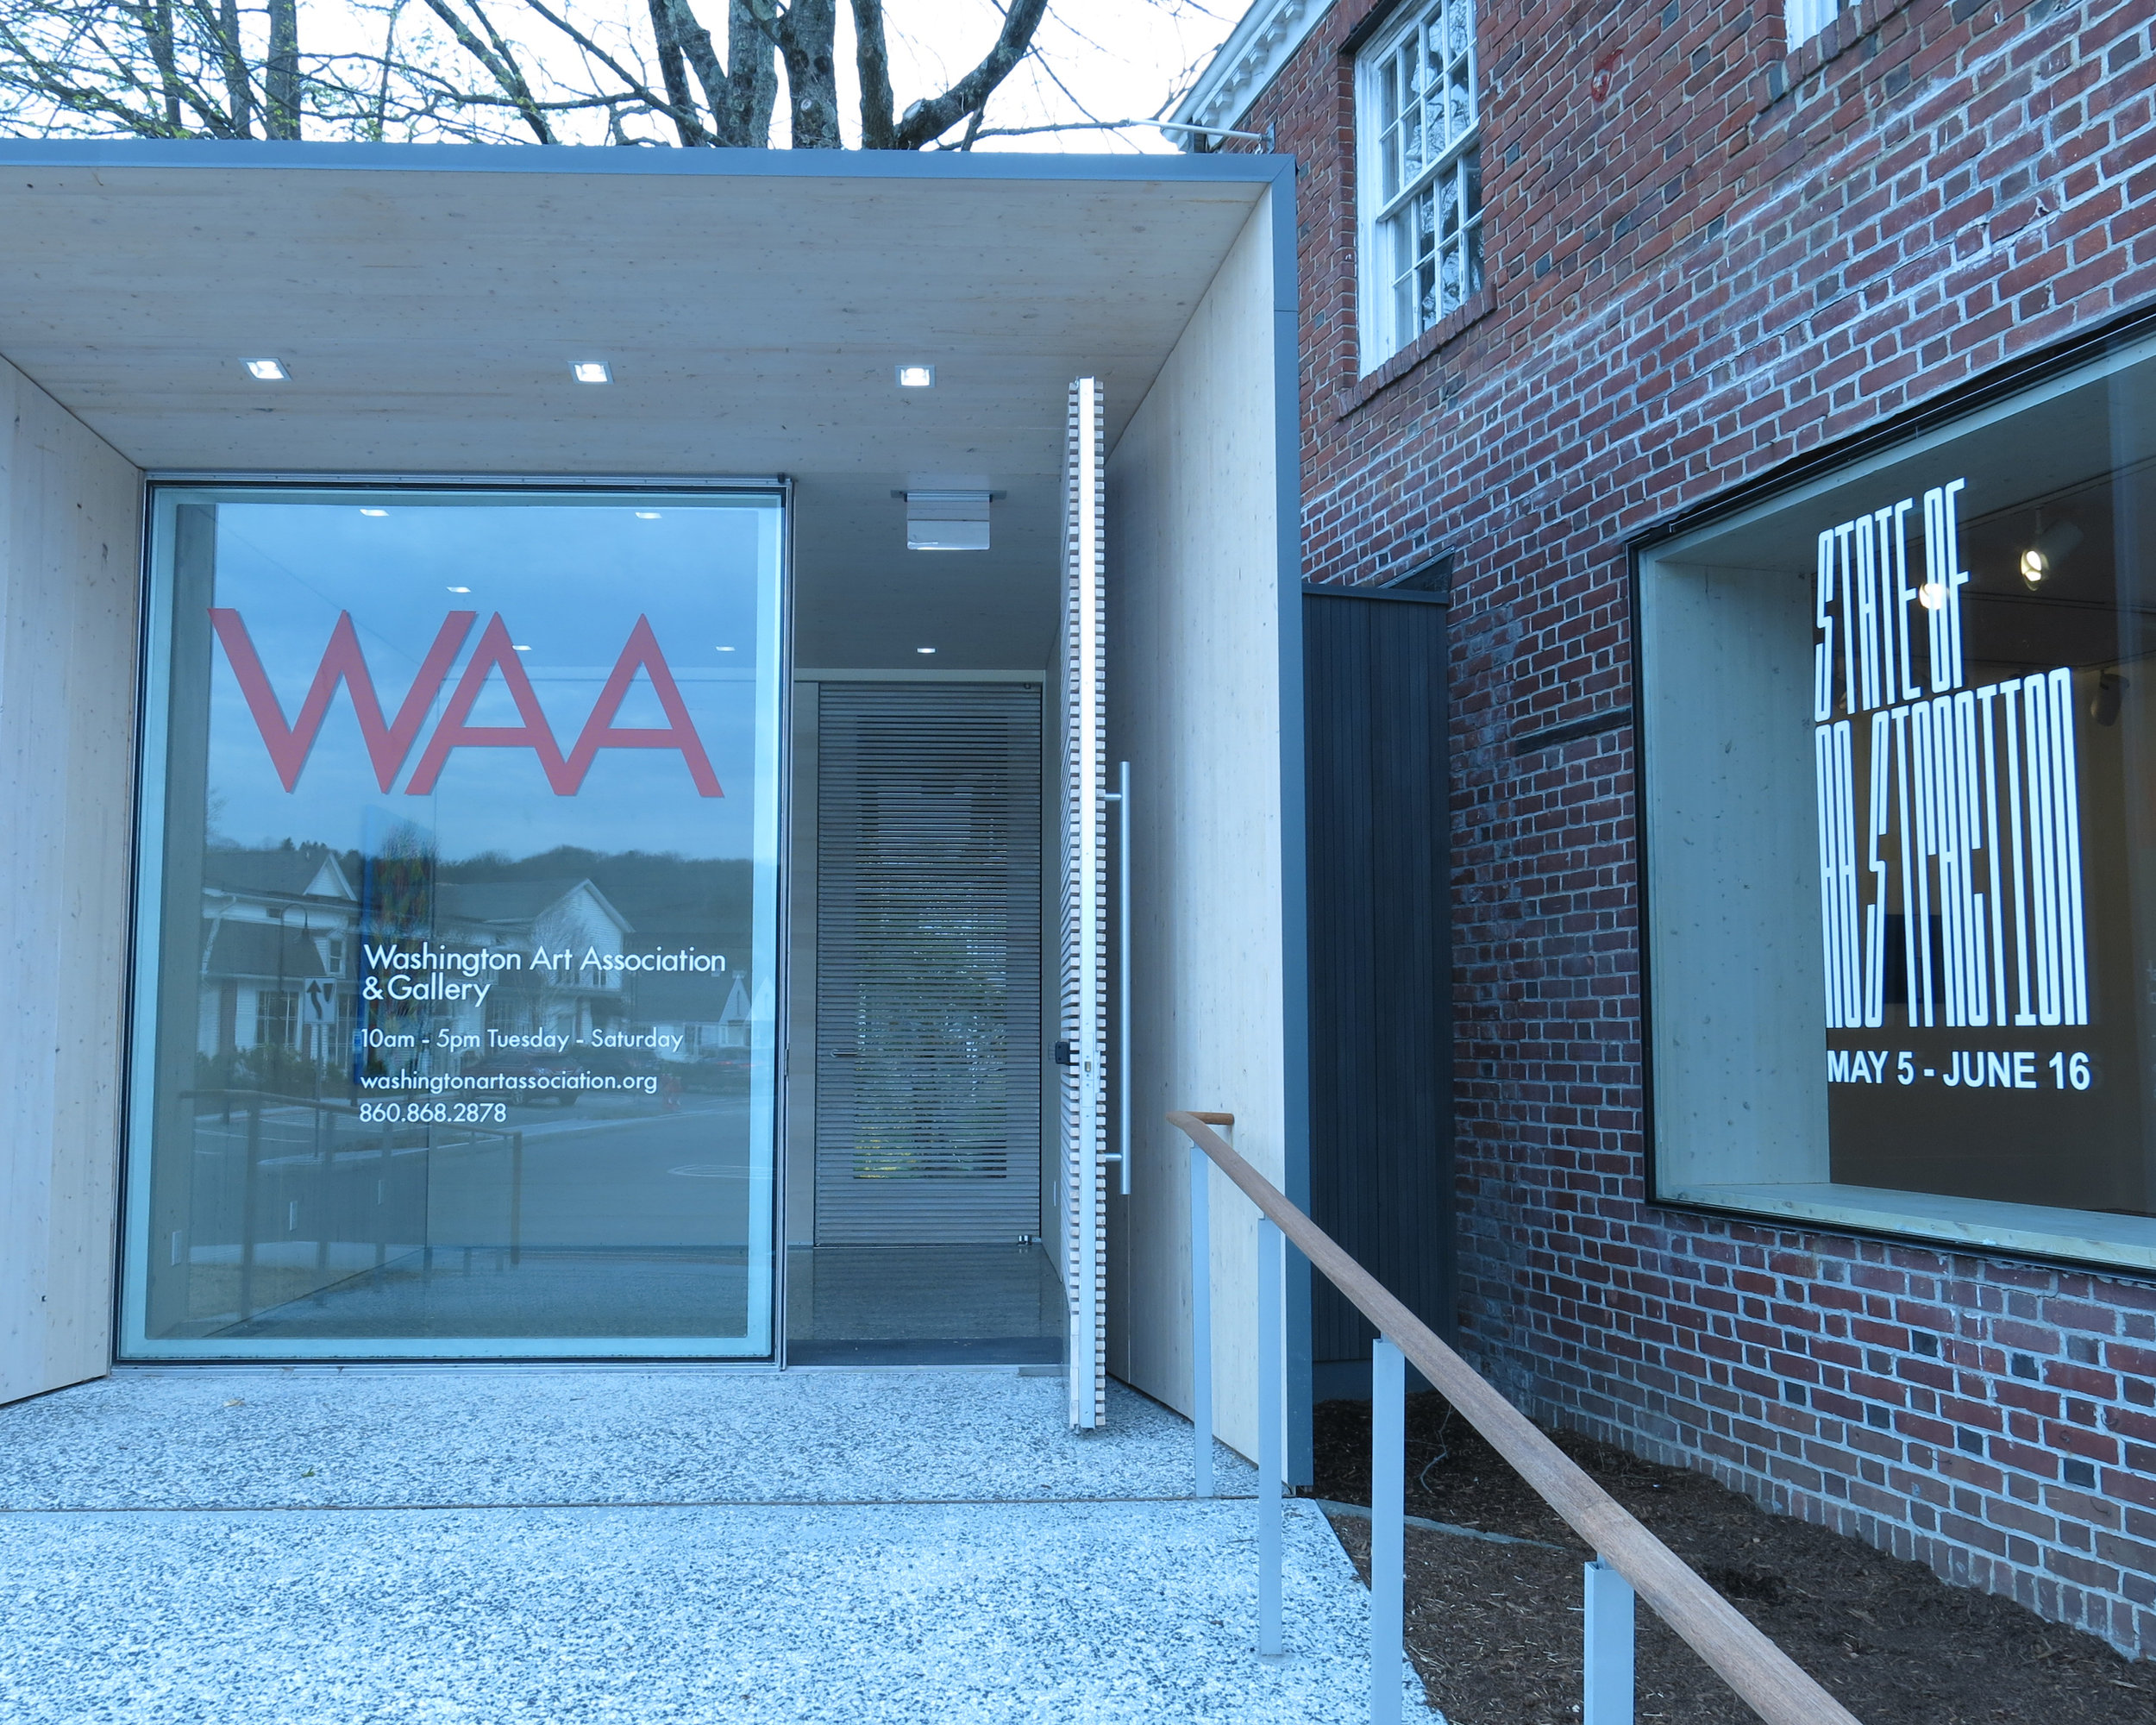 New Entry to the Washington Art Association